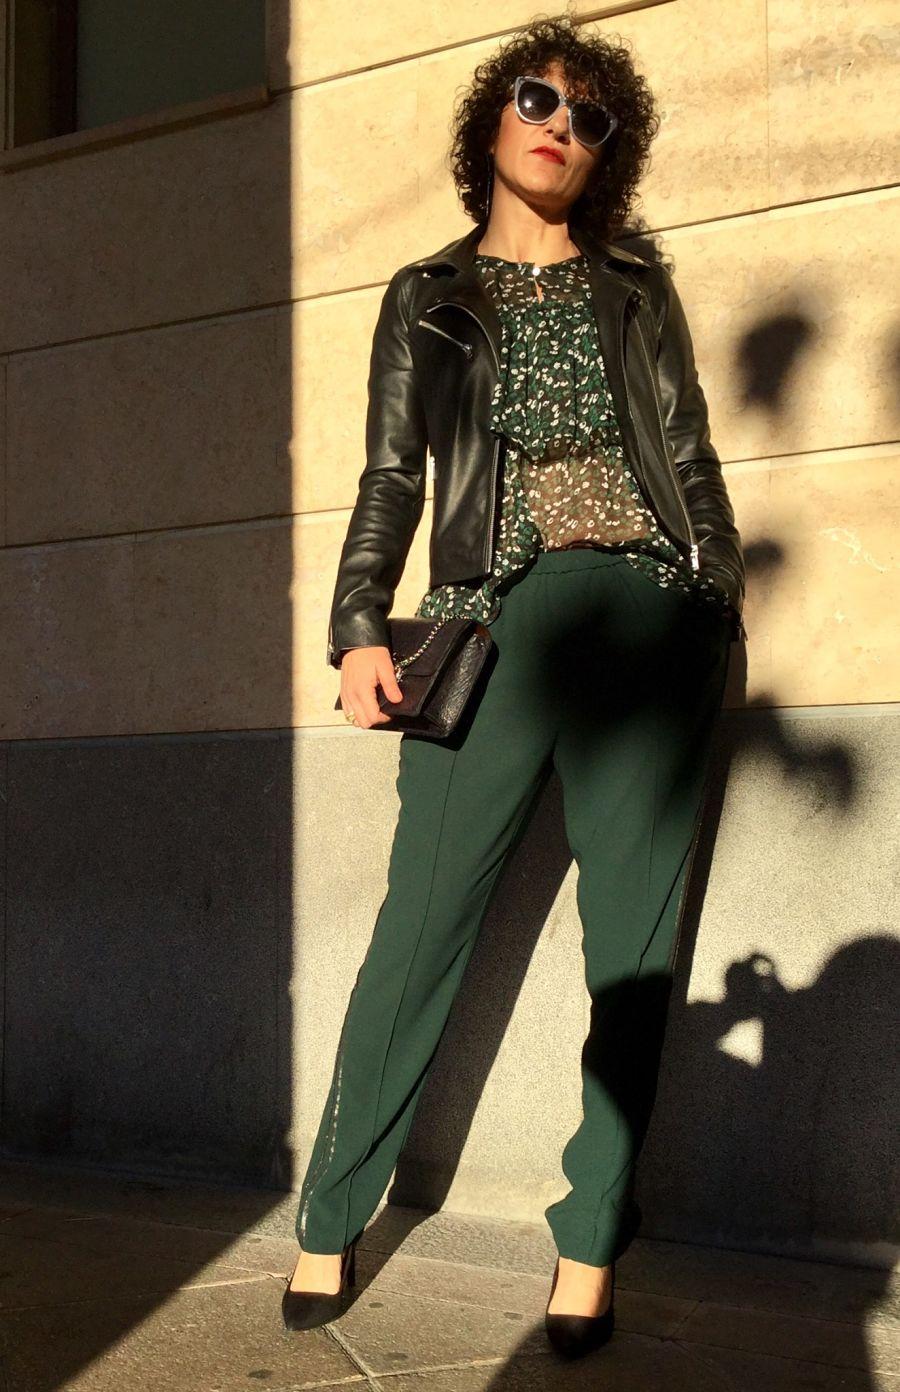 Rebeca Valdivia, asesora de imagen, asesora eventos, personal shopper, estilista, stilist, Donostia, San Sebastián, Miss Clov, tienda de ropa, clothes shop, boho & chic, boho style, accesorios